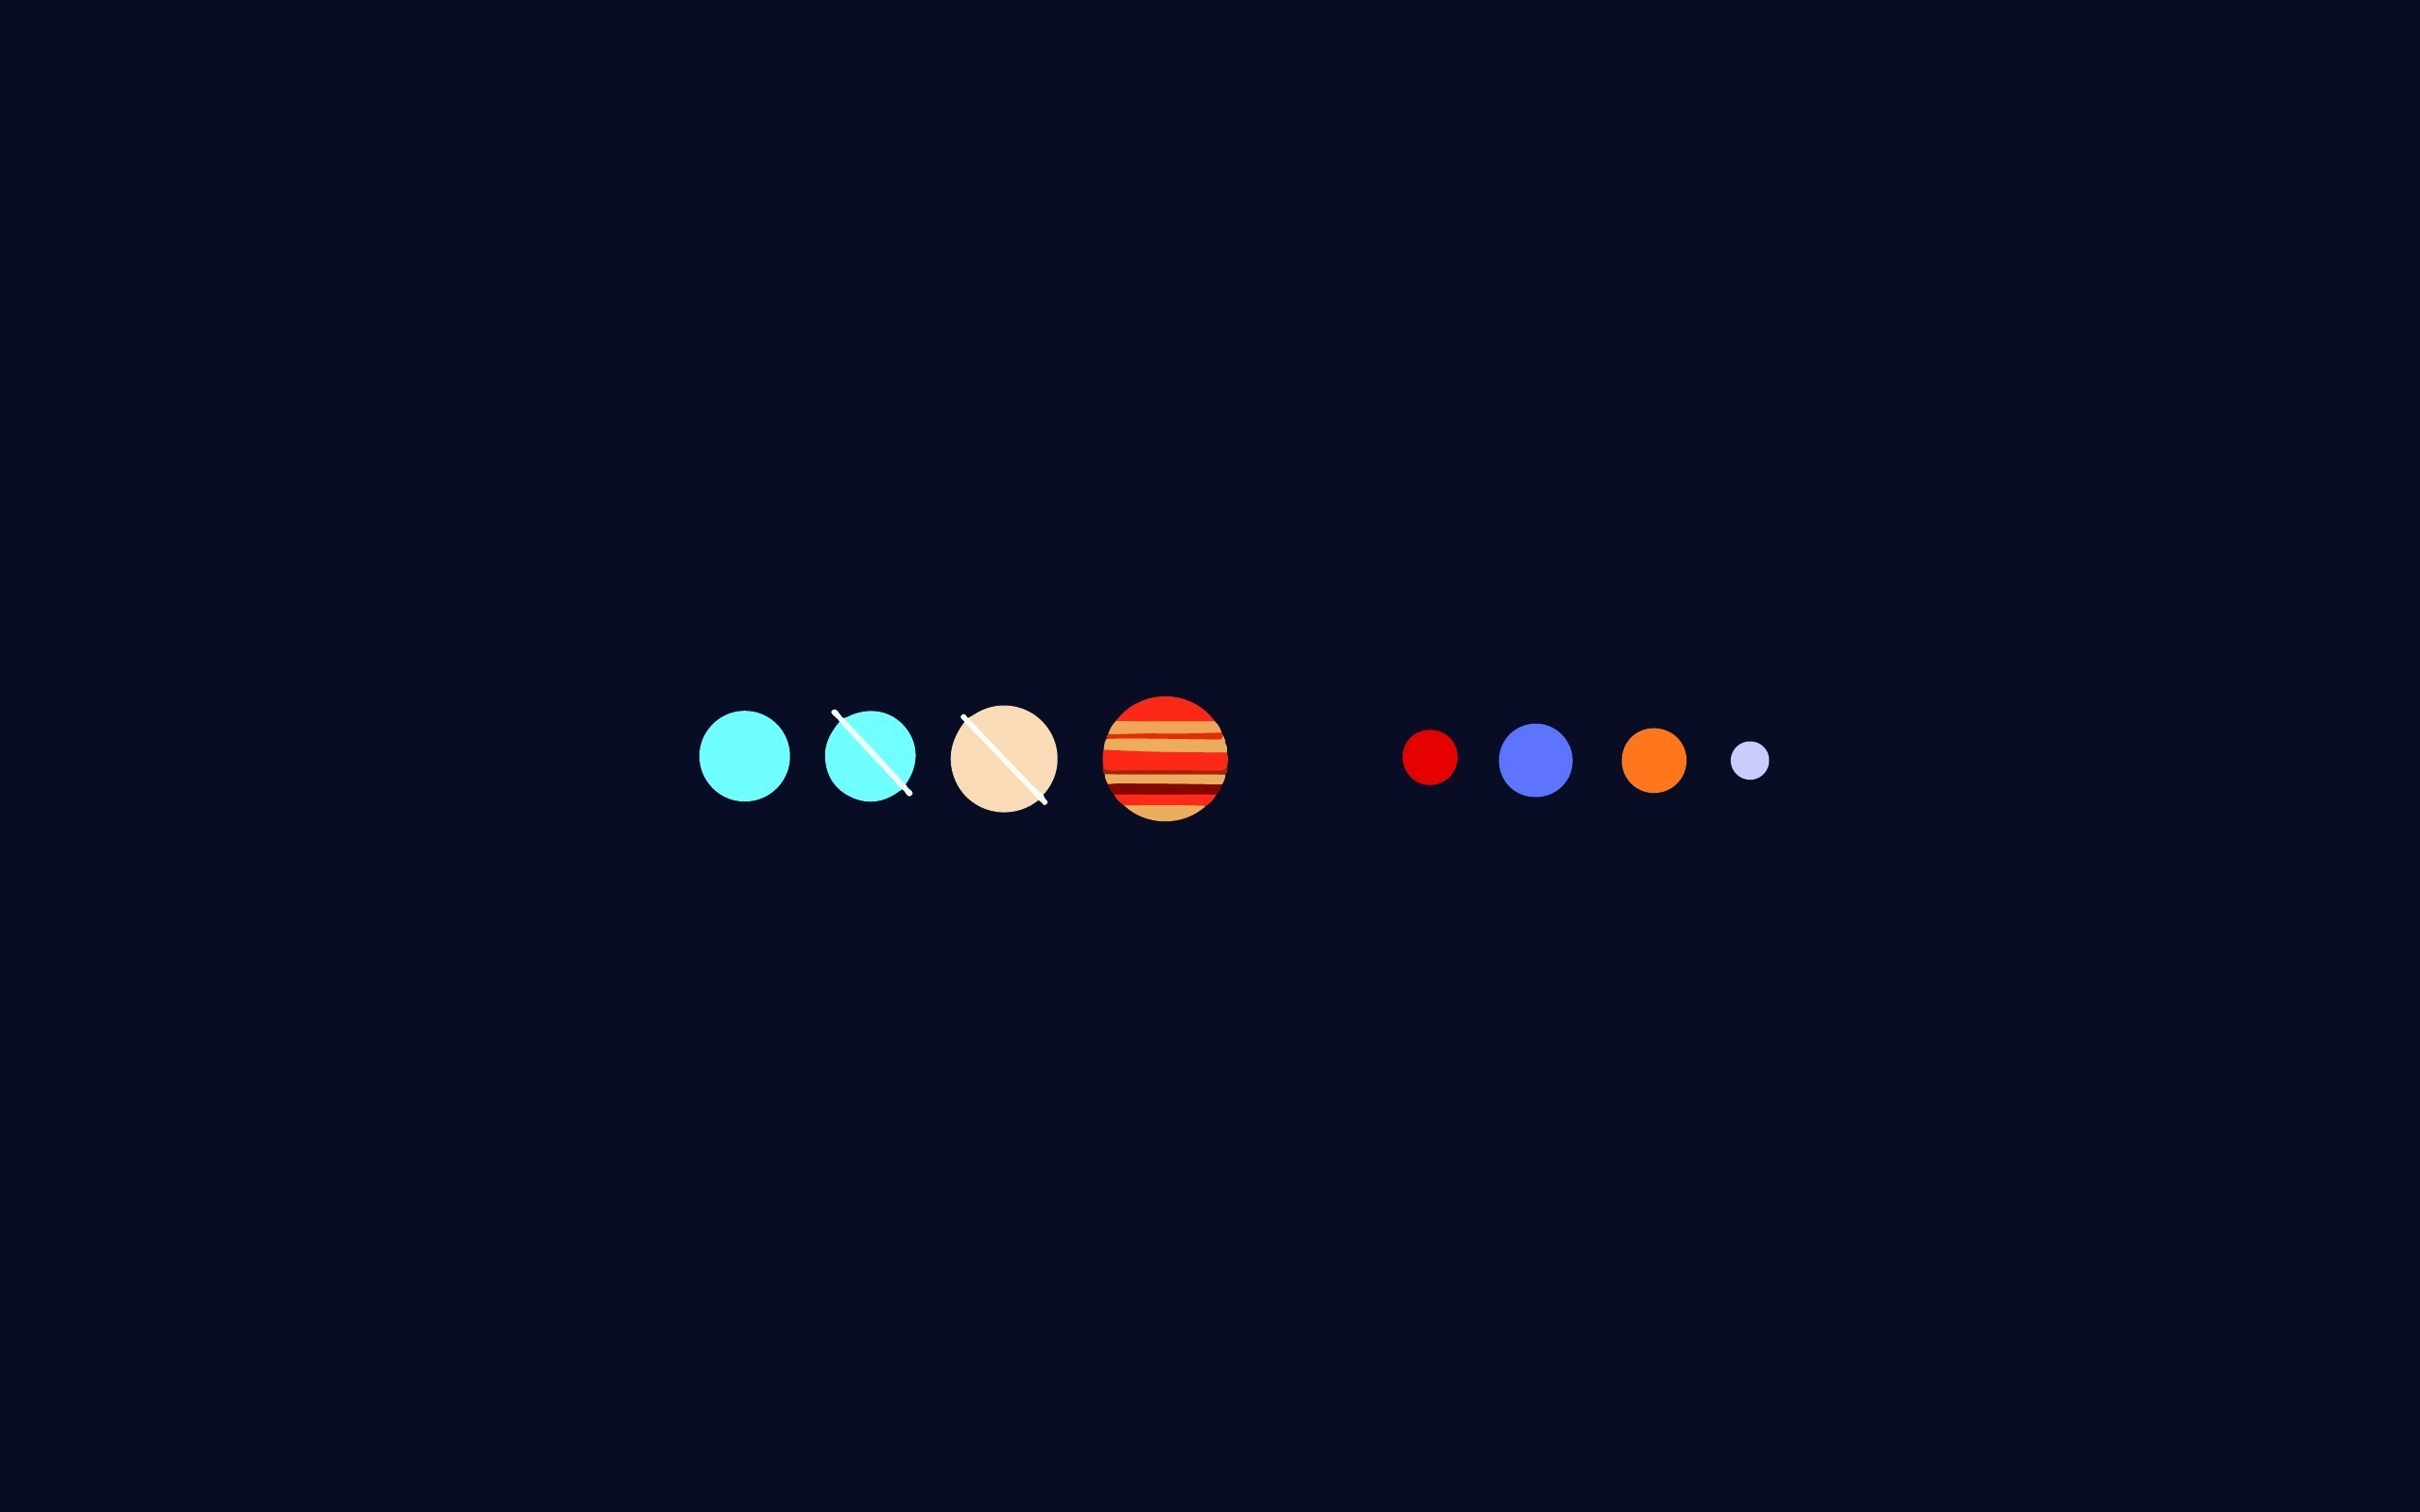 solar system hd wallpaper - photo #24